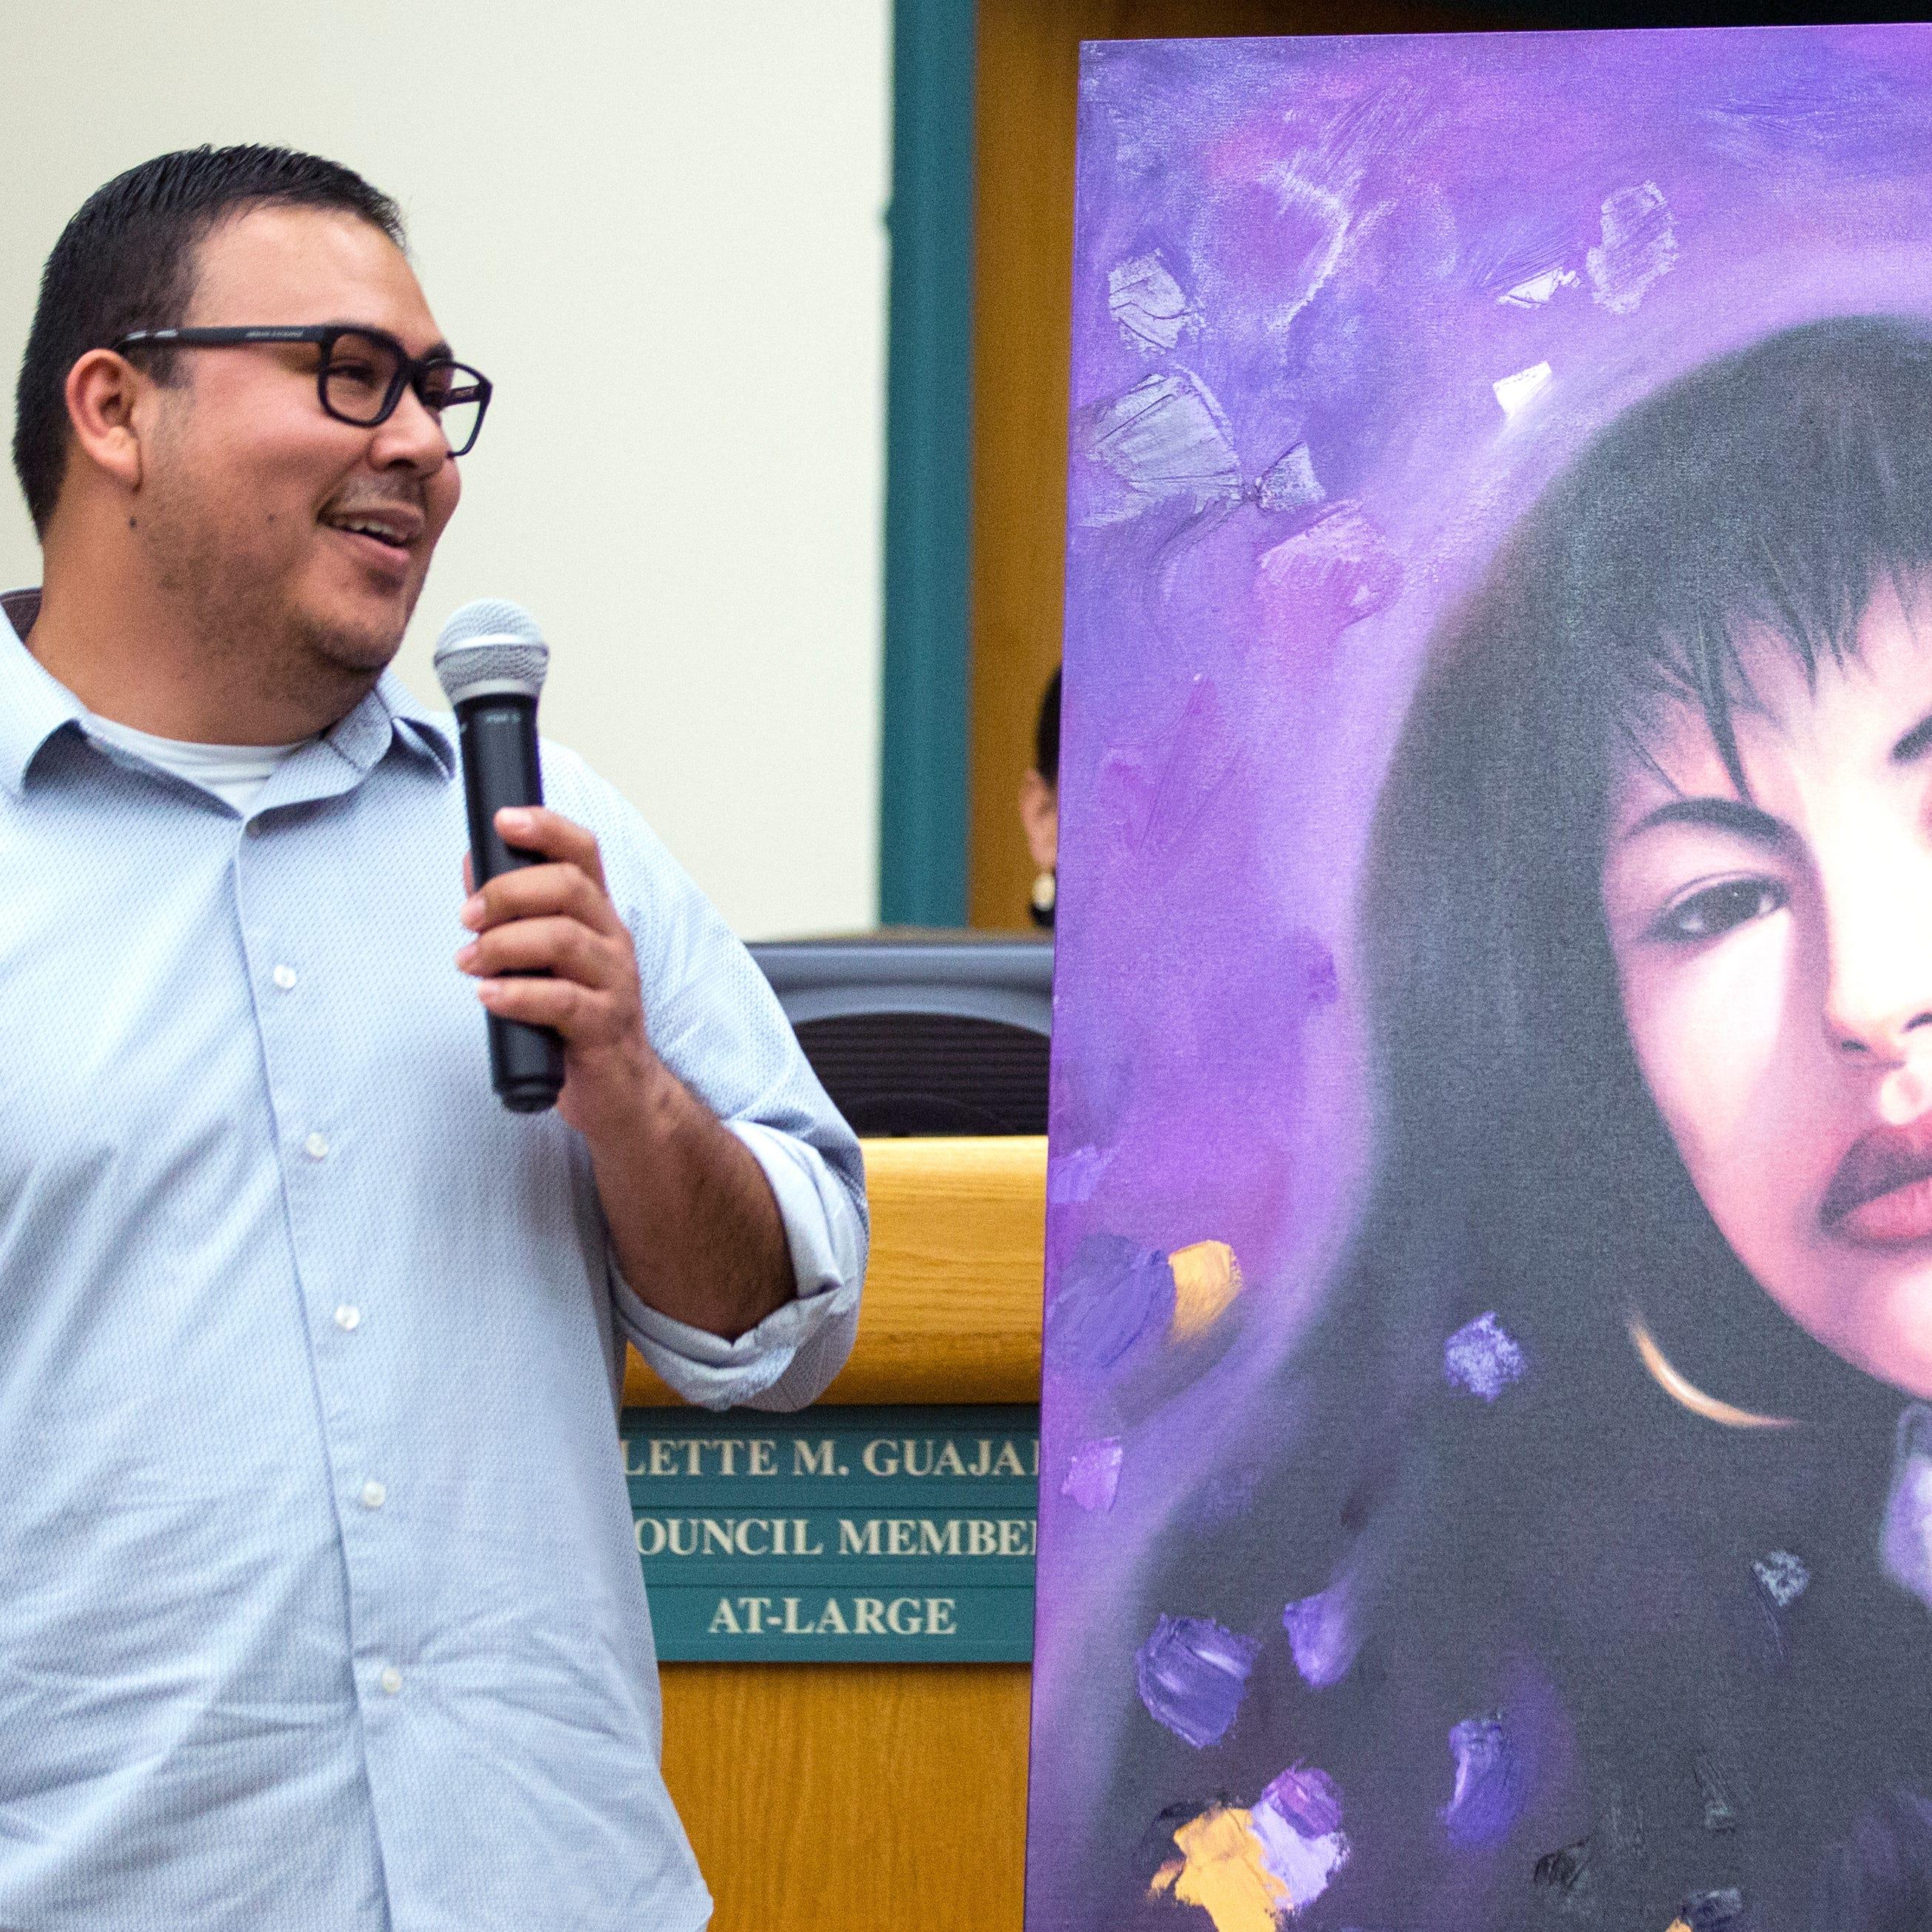 Fiesta de la Flor 2019: Citgo gives Corpus Christi a painting of Selena Quintanilla